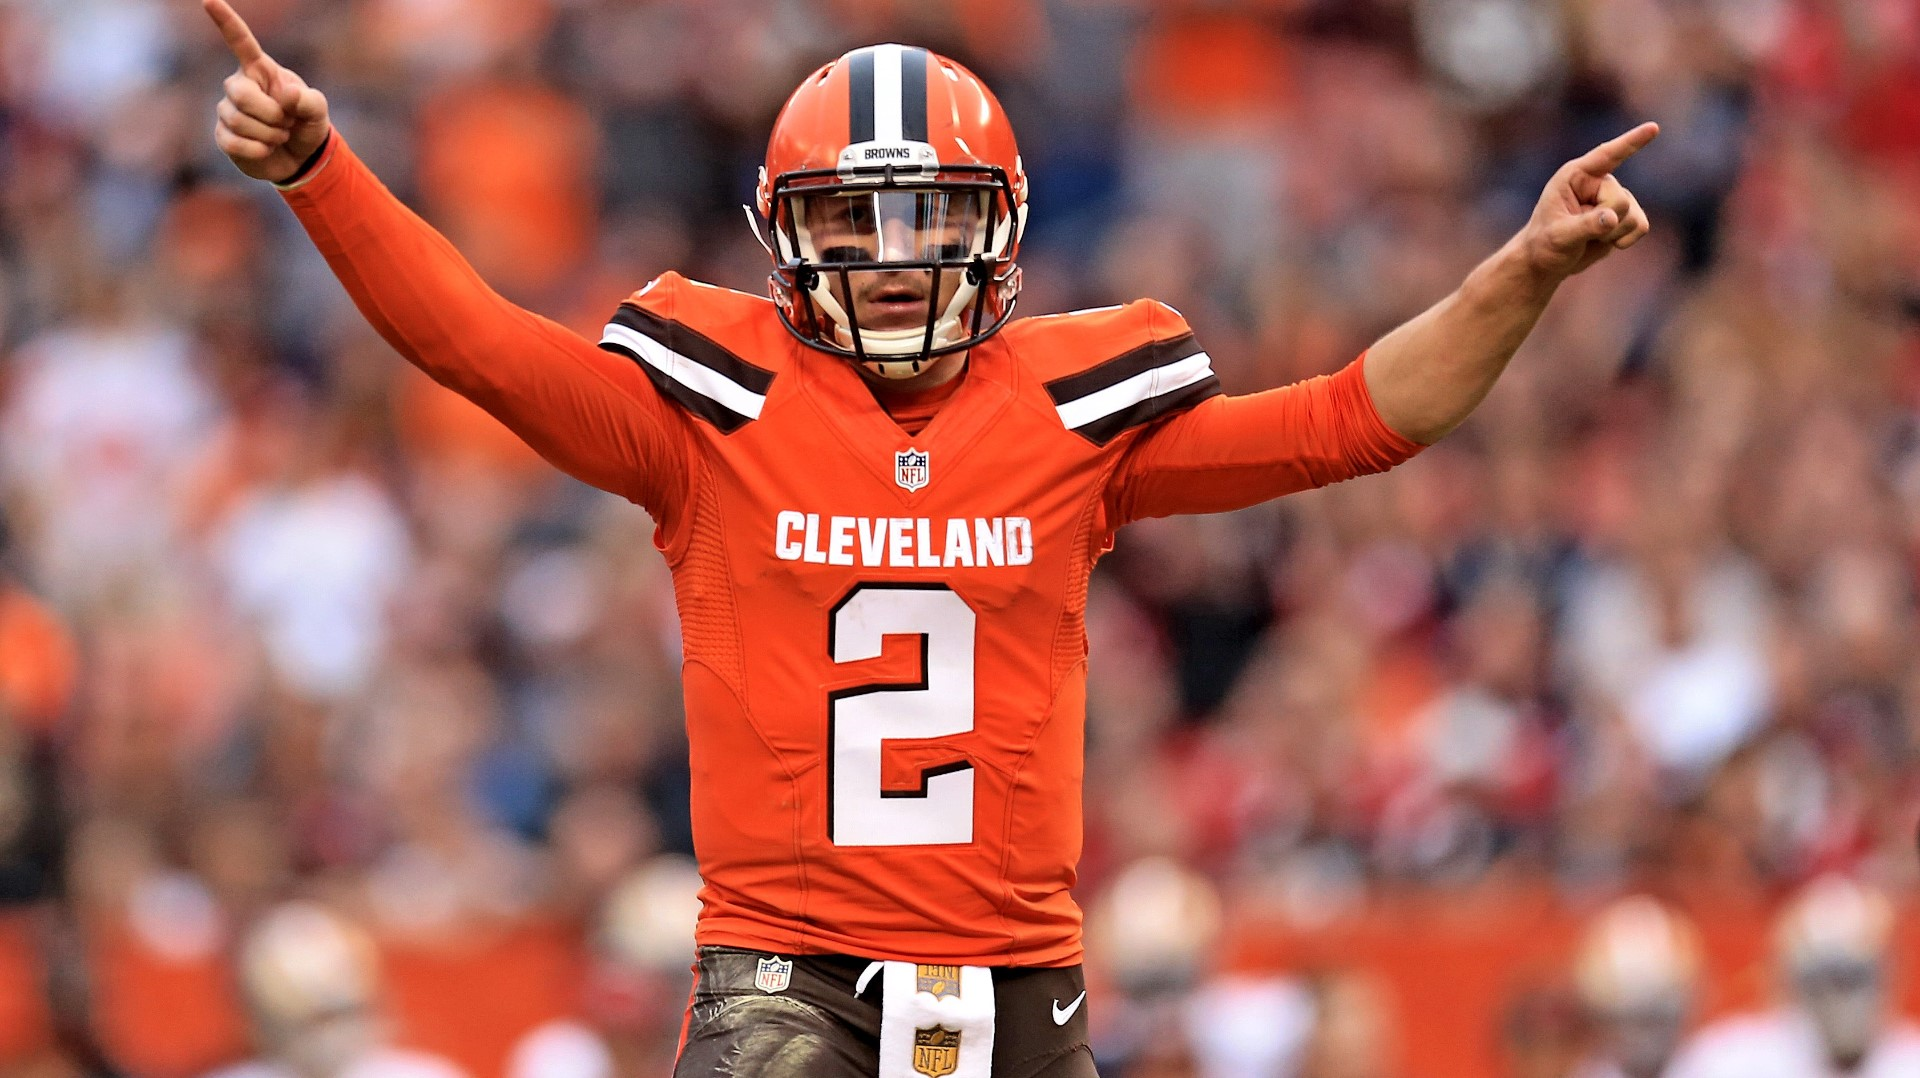 Johnny Manziel trolls Cleveland Browns uniforms   wkyc.com